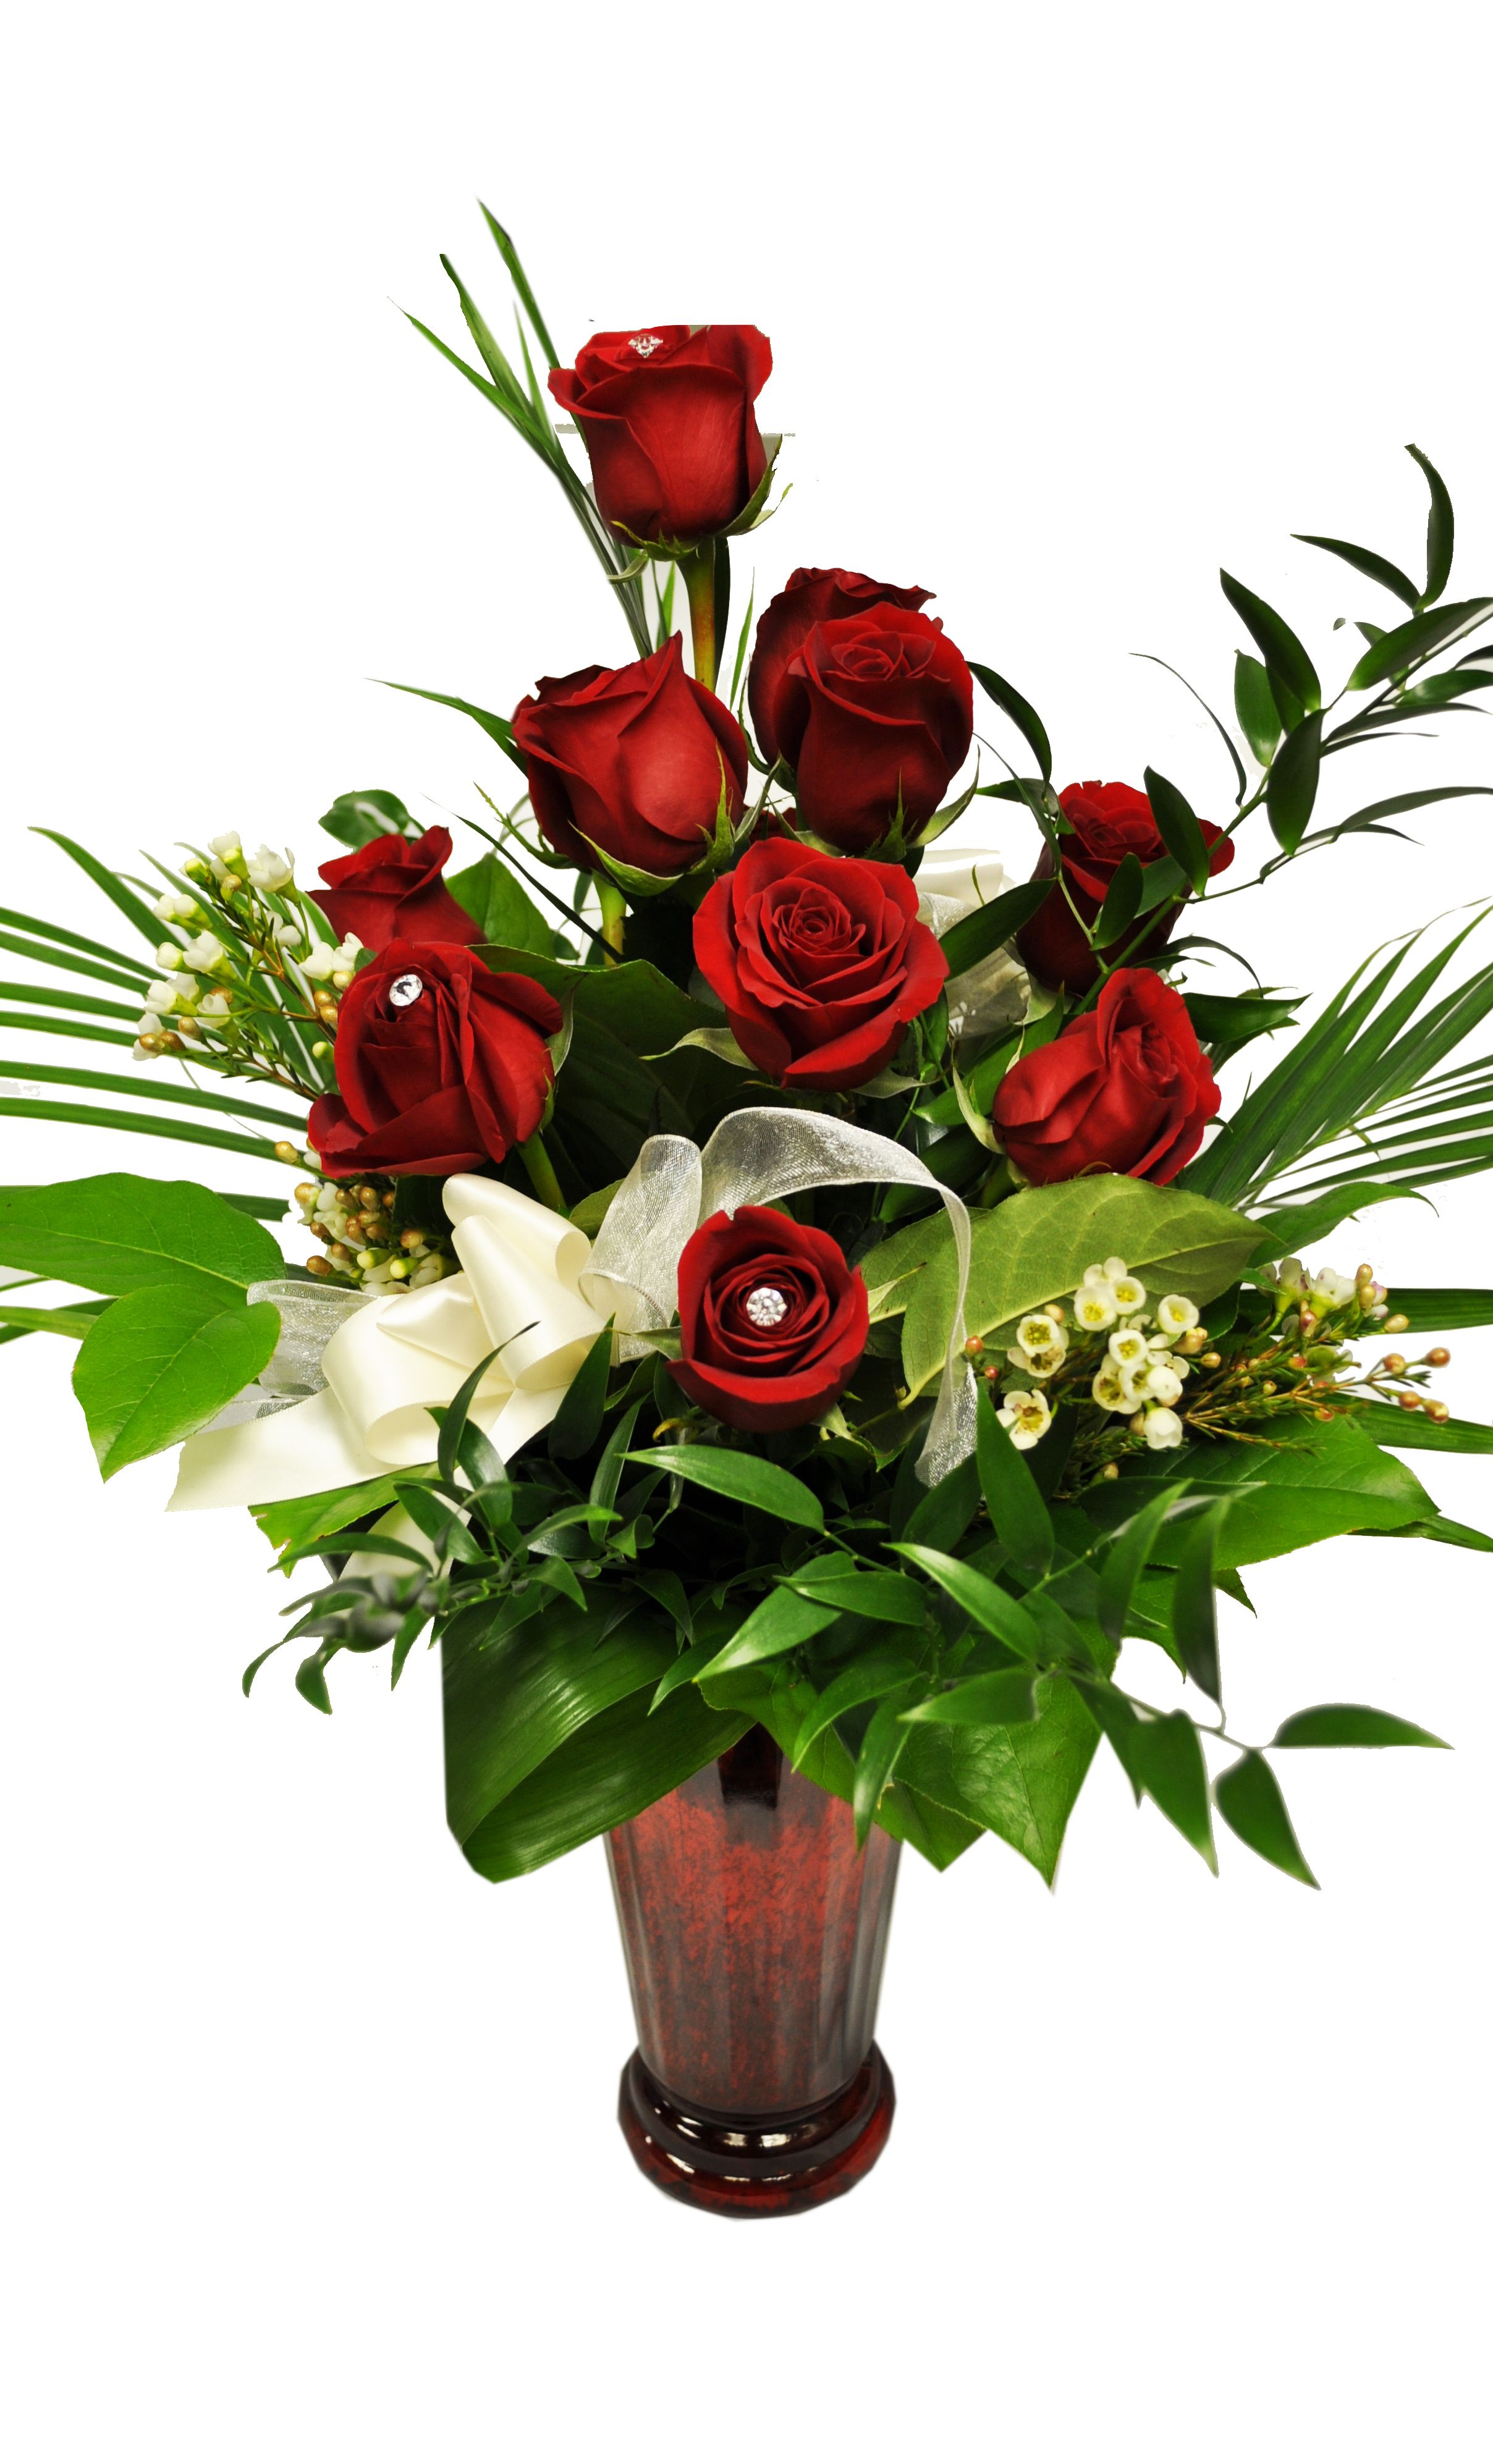 Calgary Creative Edge Flowers Red rose arrangements